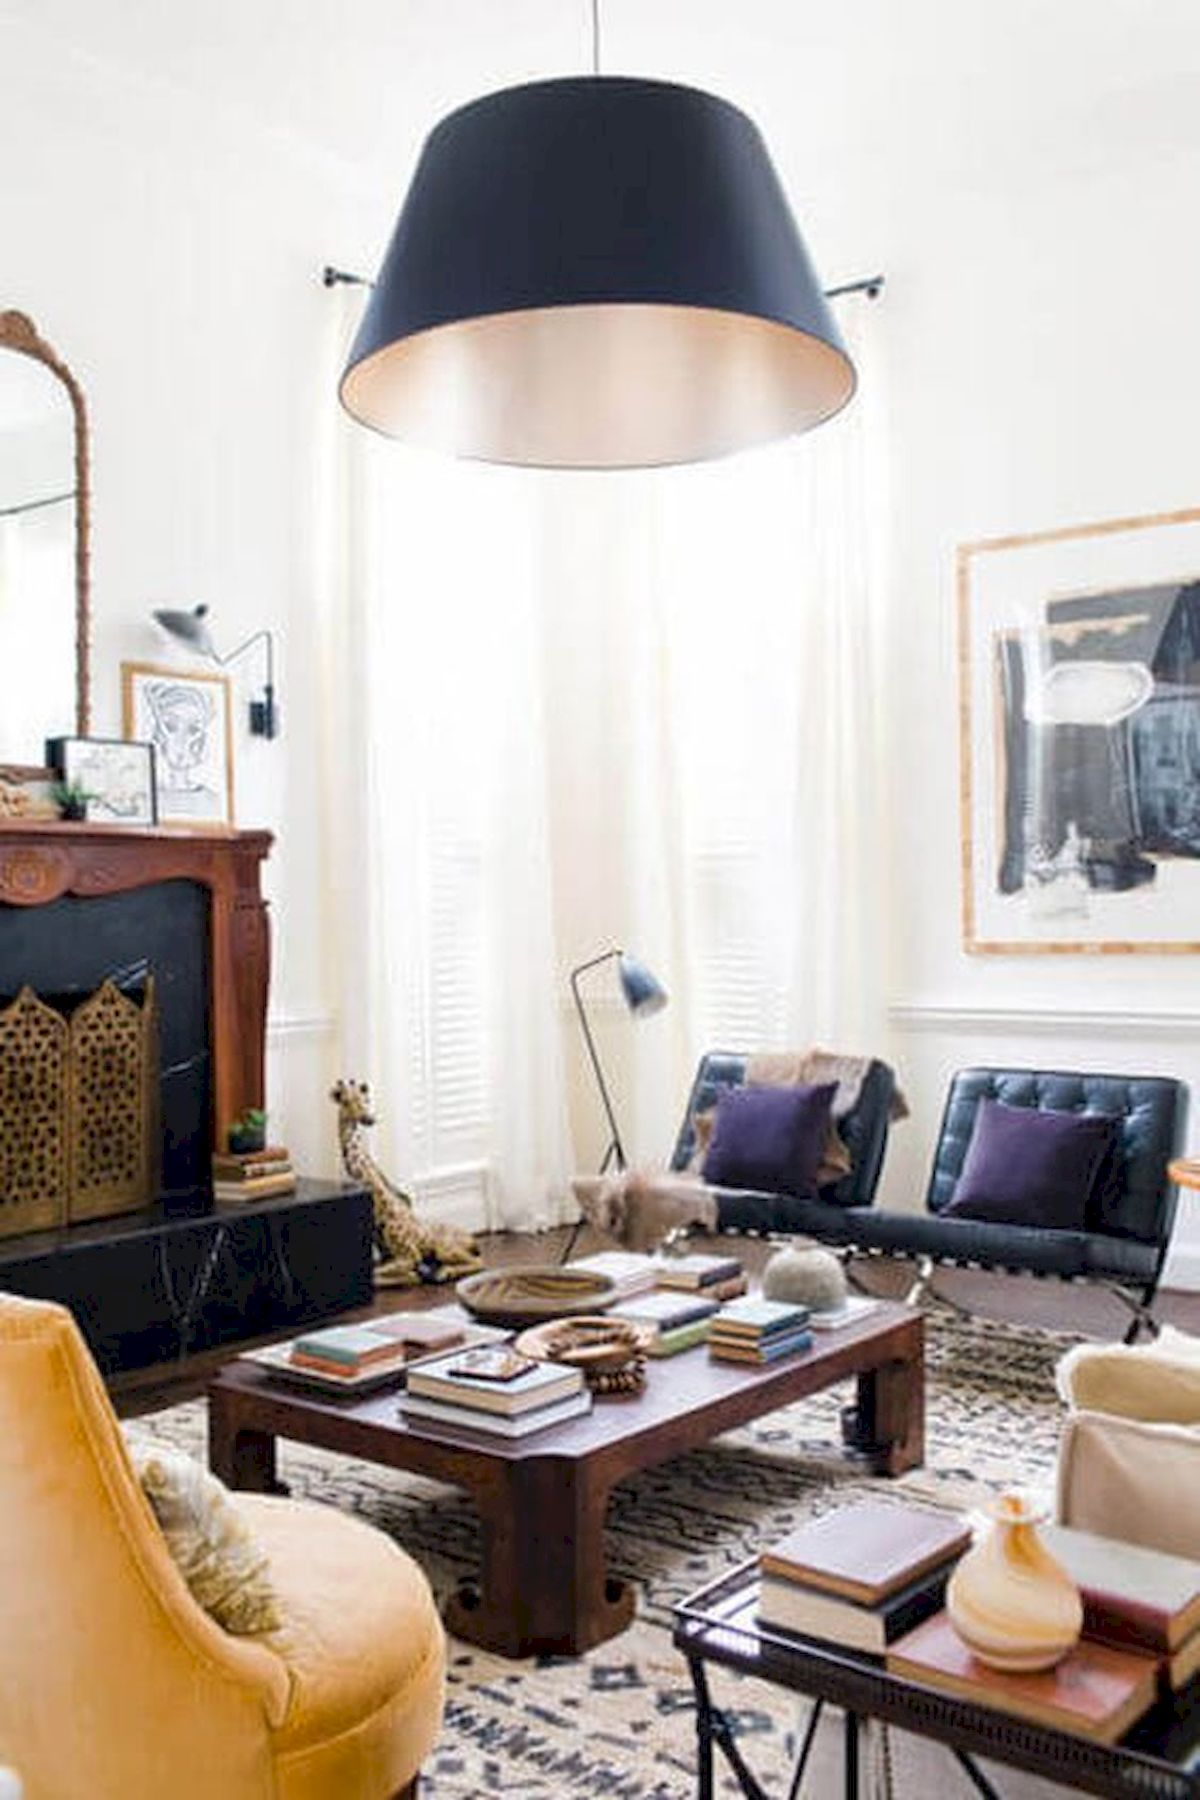 45 Brilliant DIY Living Room Design And Decor Ideas For Small Apartment (15)